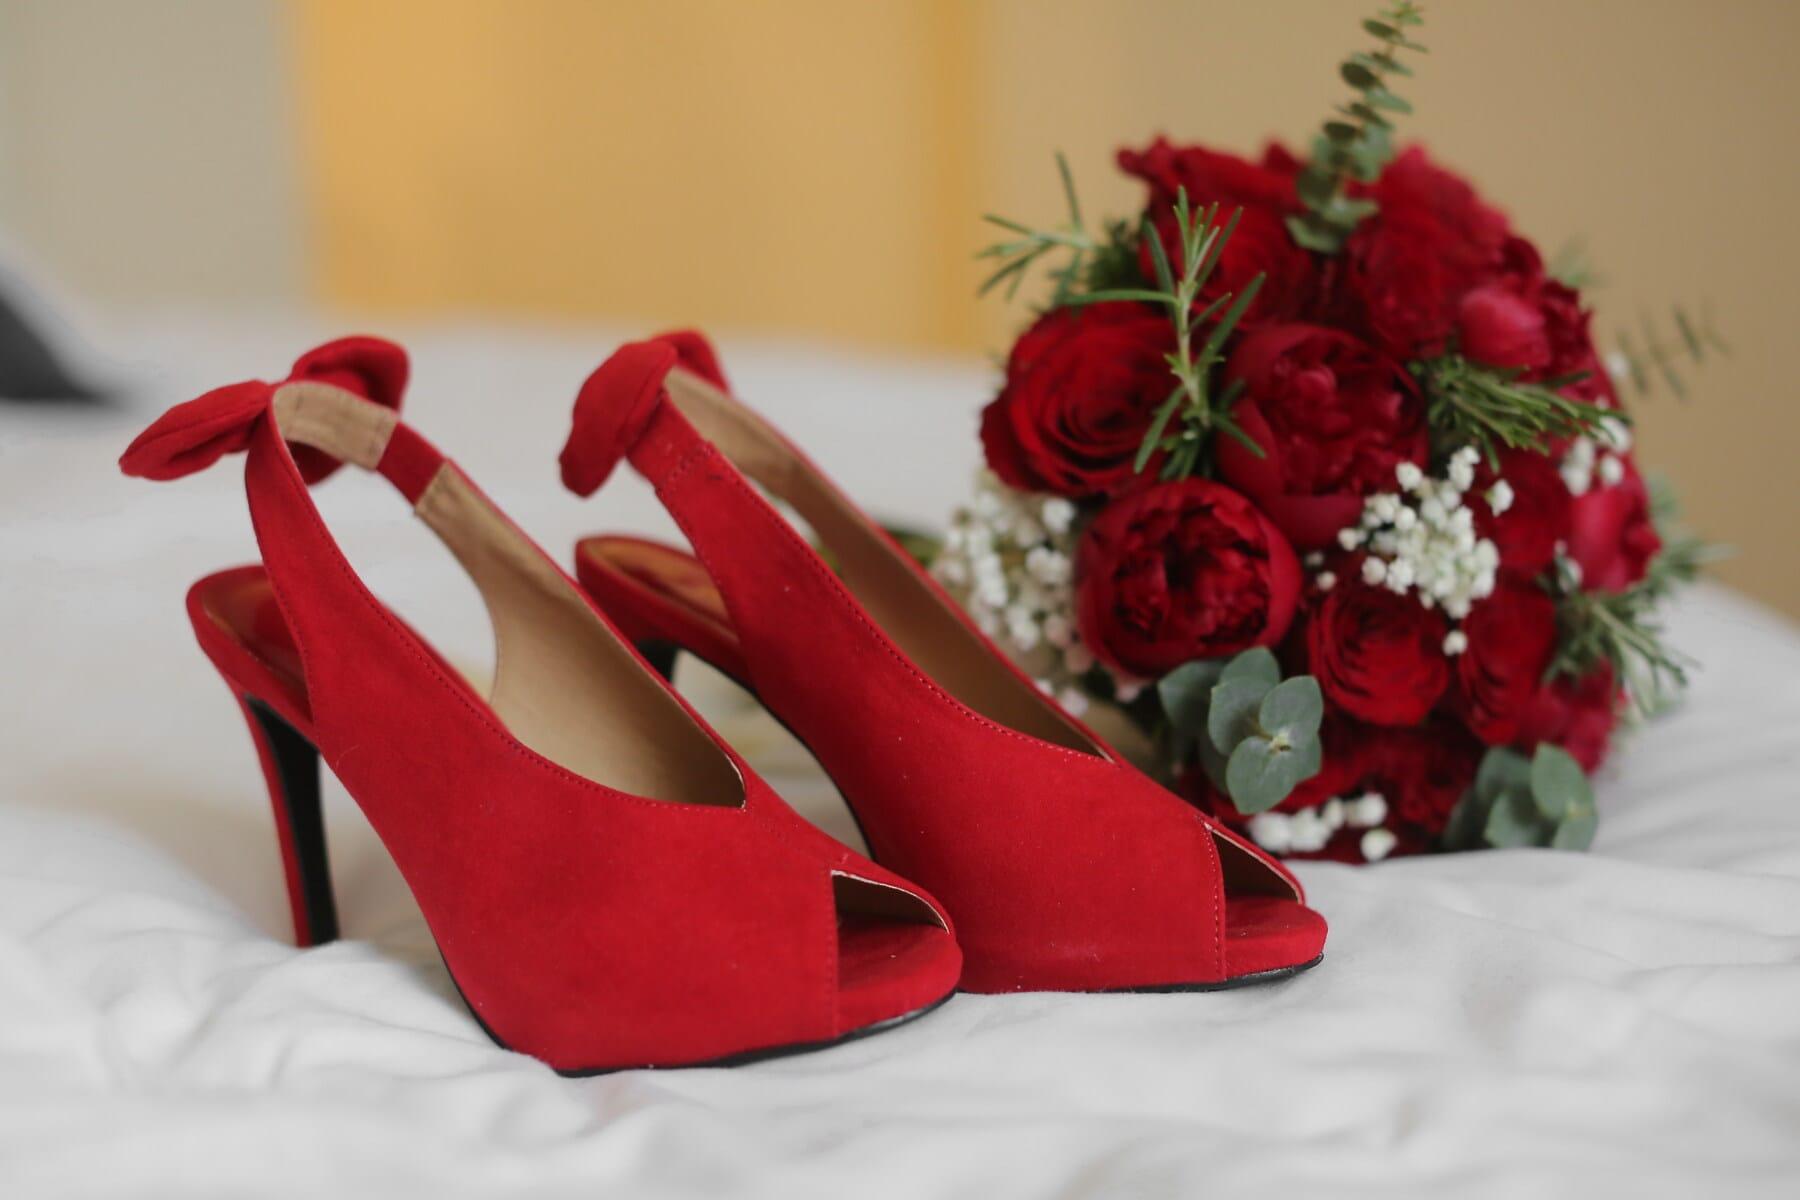 red, heels, shoes, sandal, wedding, wedding bouquet, flower, arrangement, bouquet, decoration